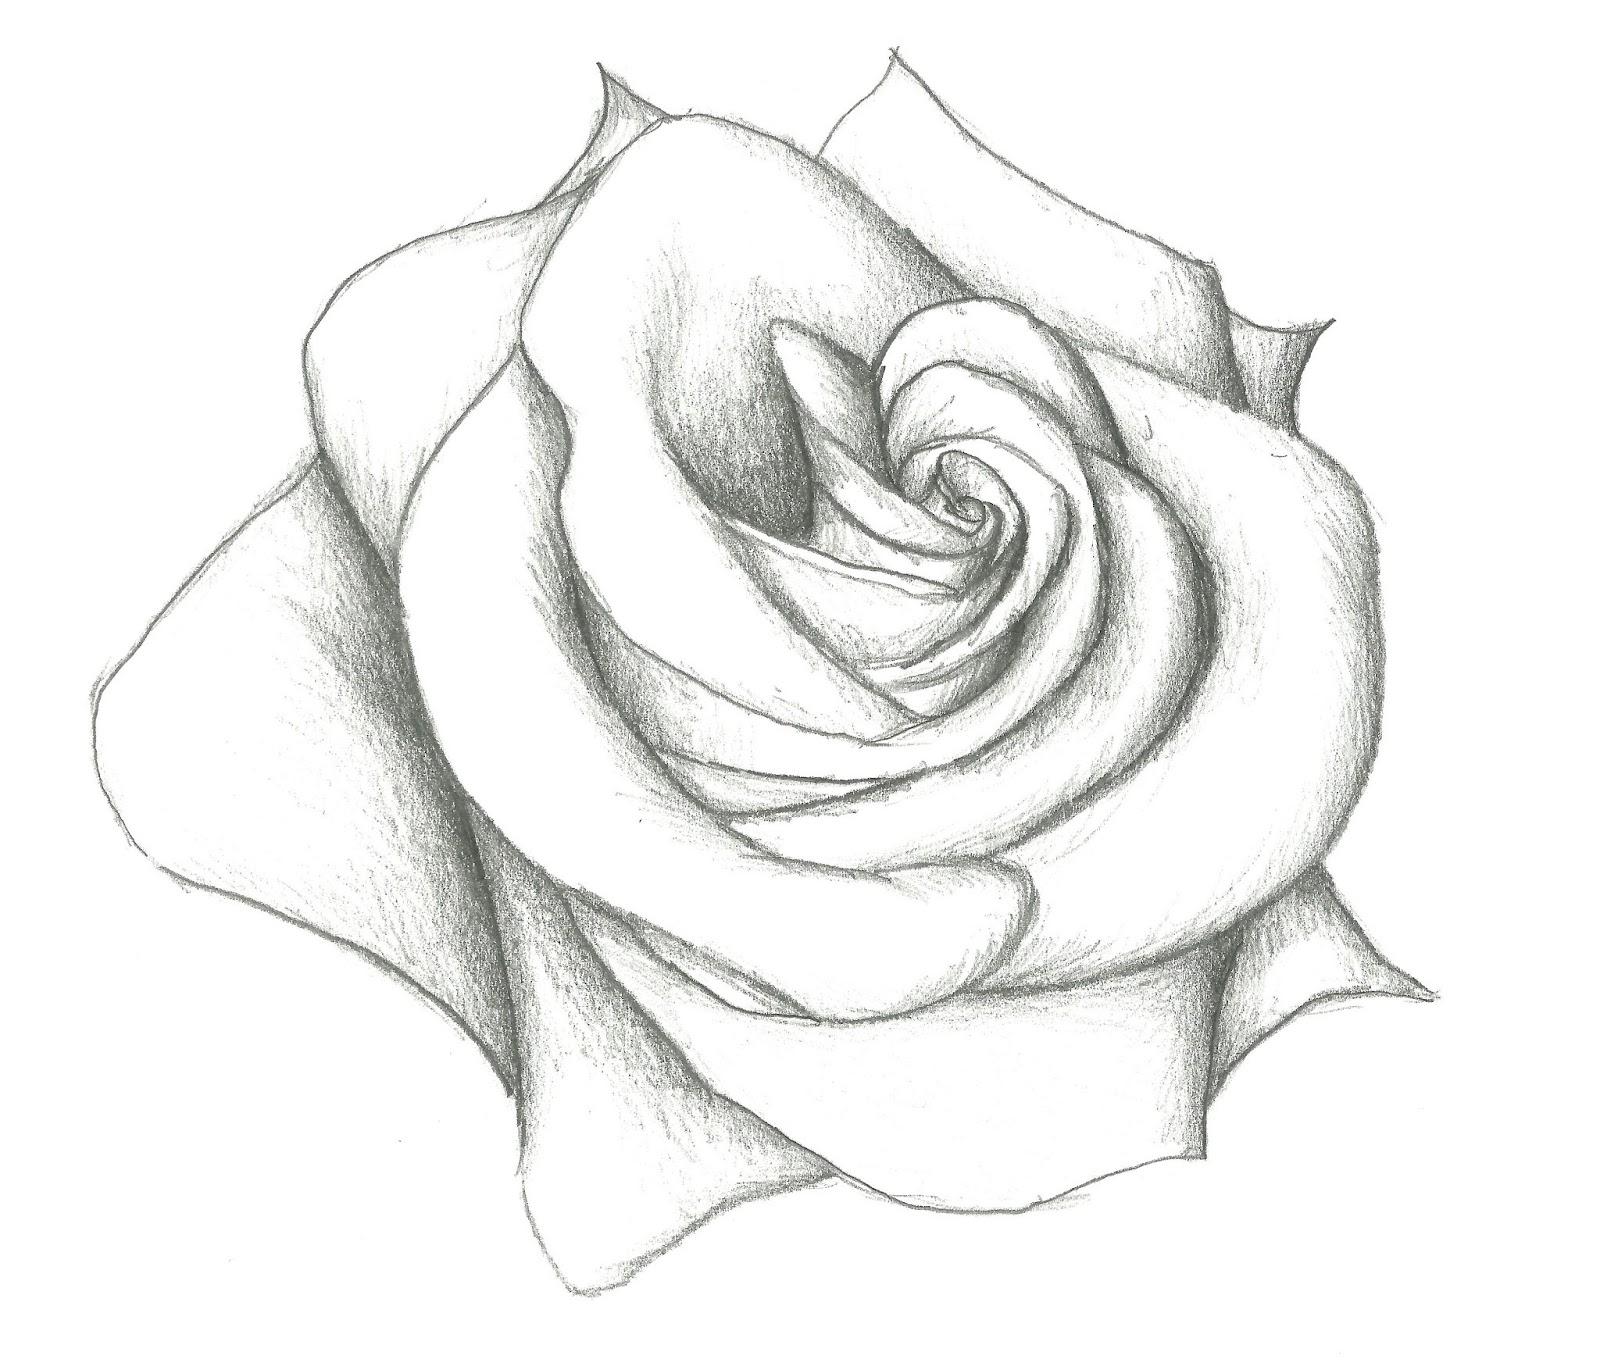 Drawn hearts big rose Hearts 12 Easy Model Pencil